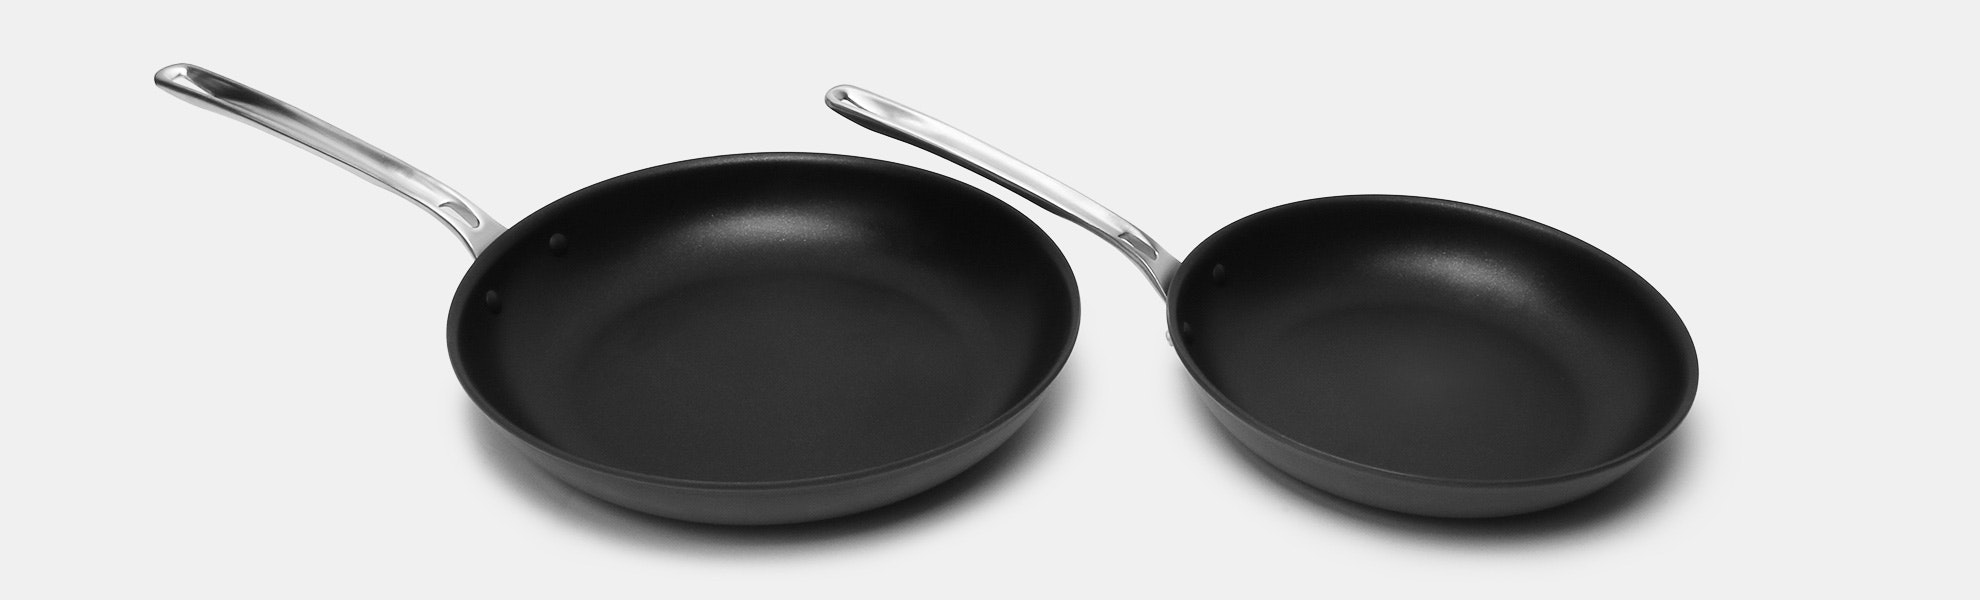 Viking Hard-Anodized 2-Piece Fry Pan Set